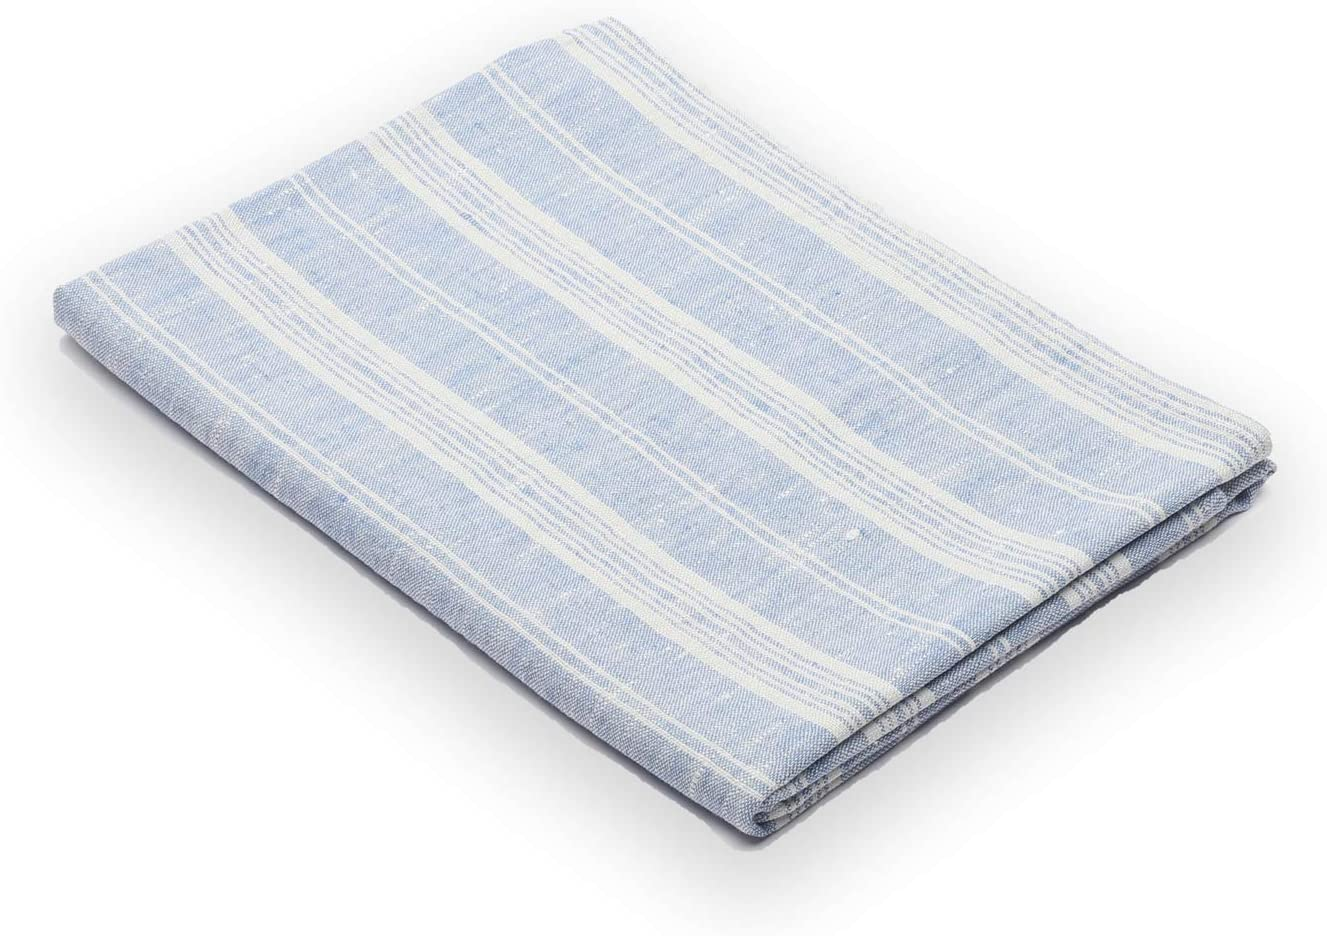 "LinenMe Multi Stripe Bath Towel, 26 by 51""-inch, Blue/White, Prewashed, 100% European Linen"